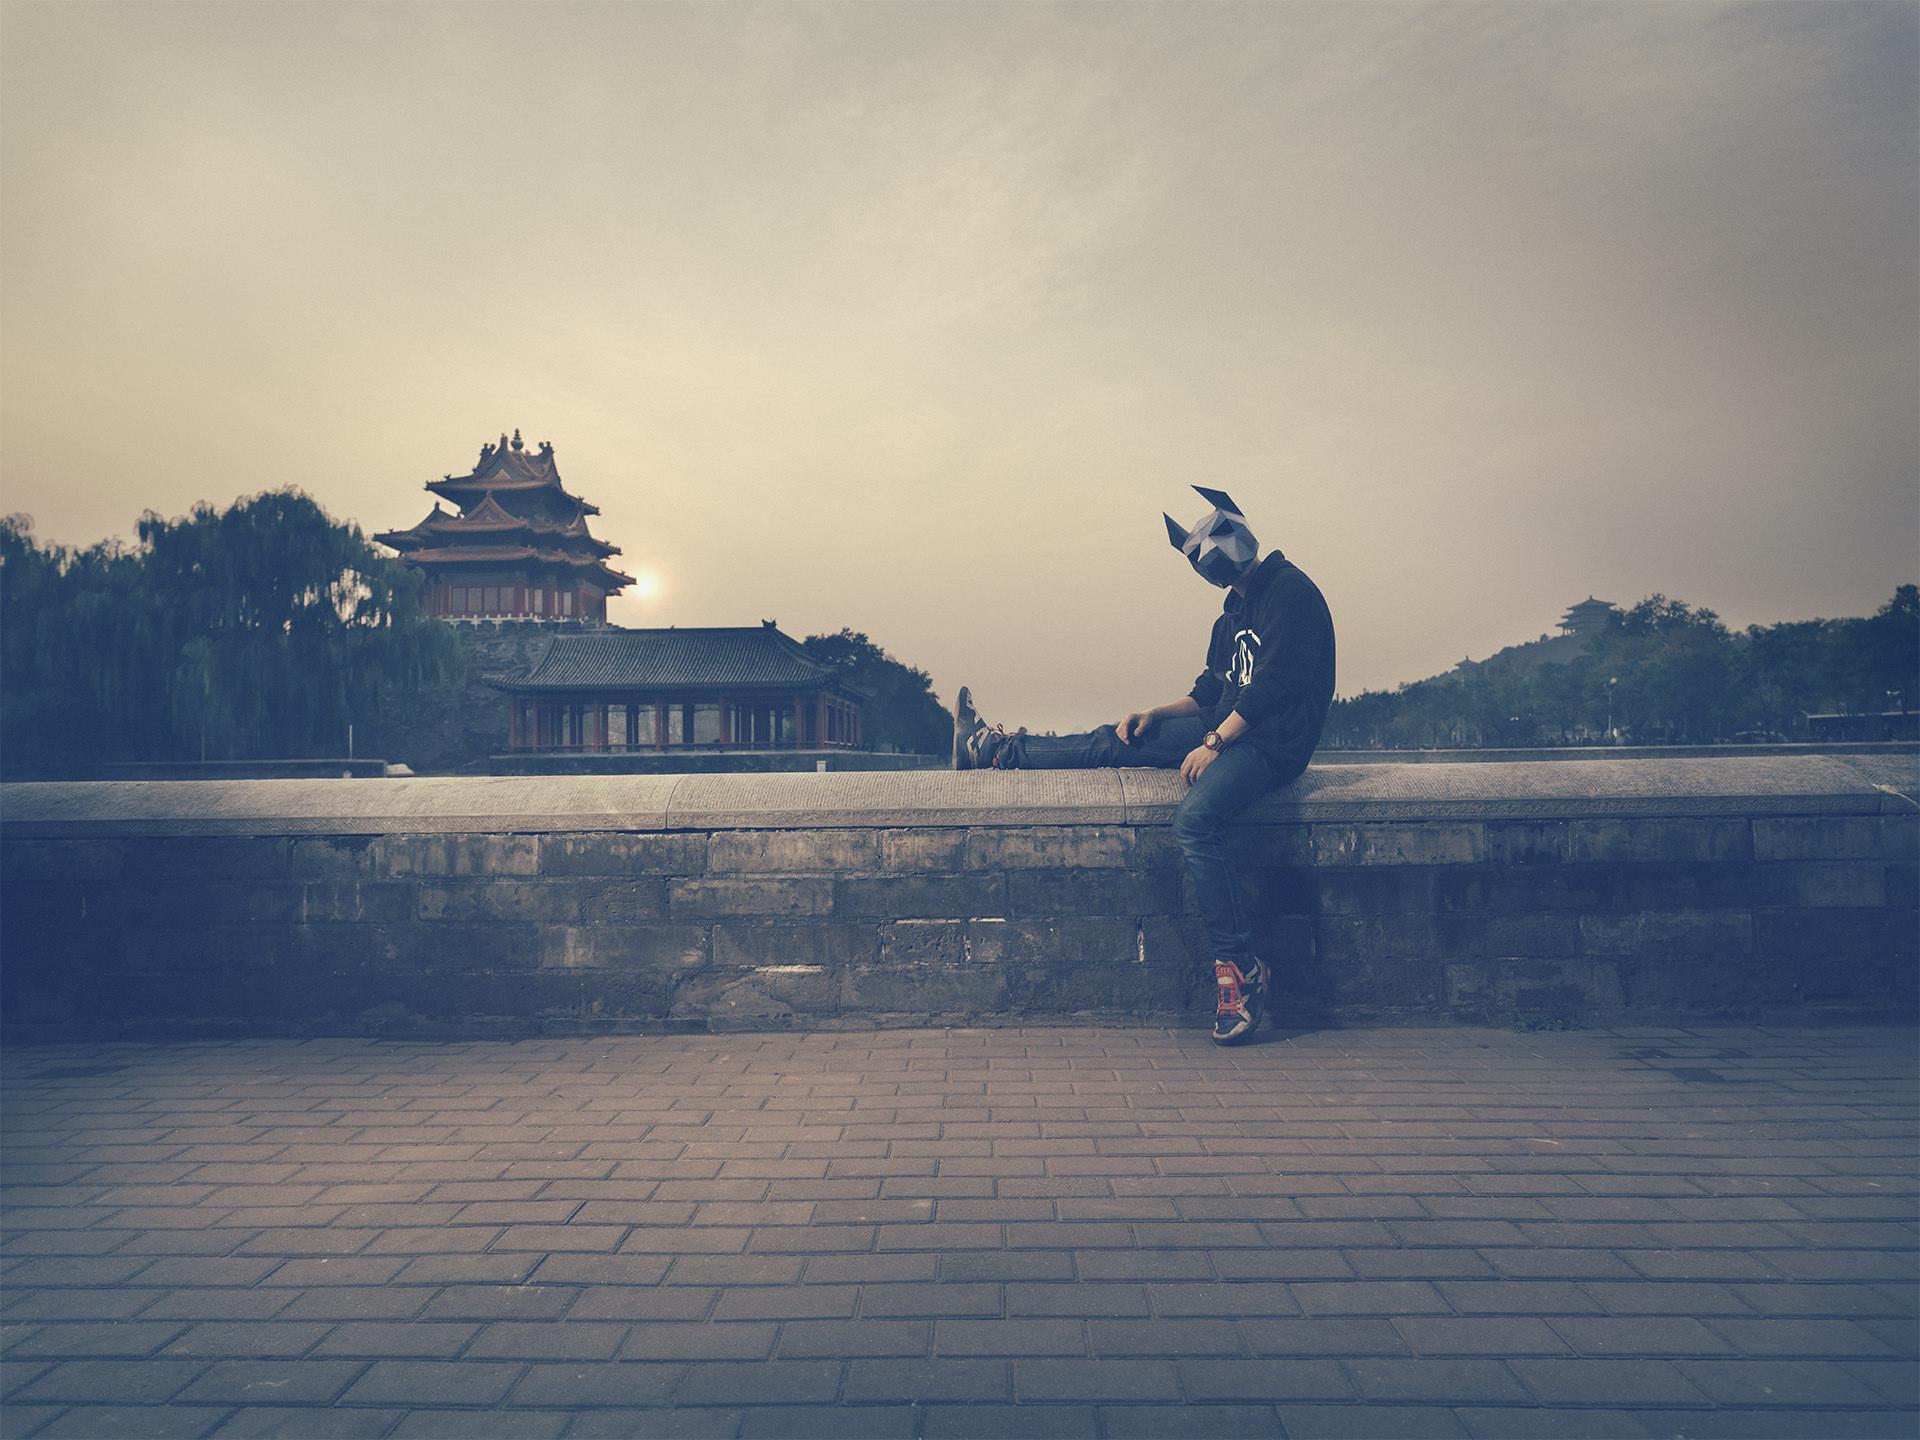 2016, china, beijing, city, urban, mask